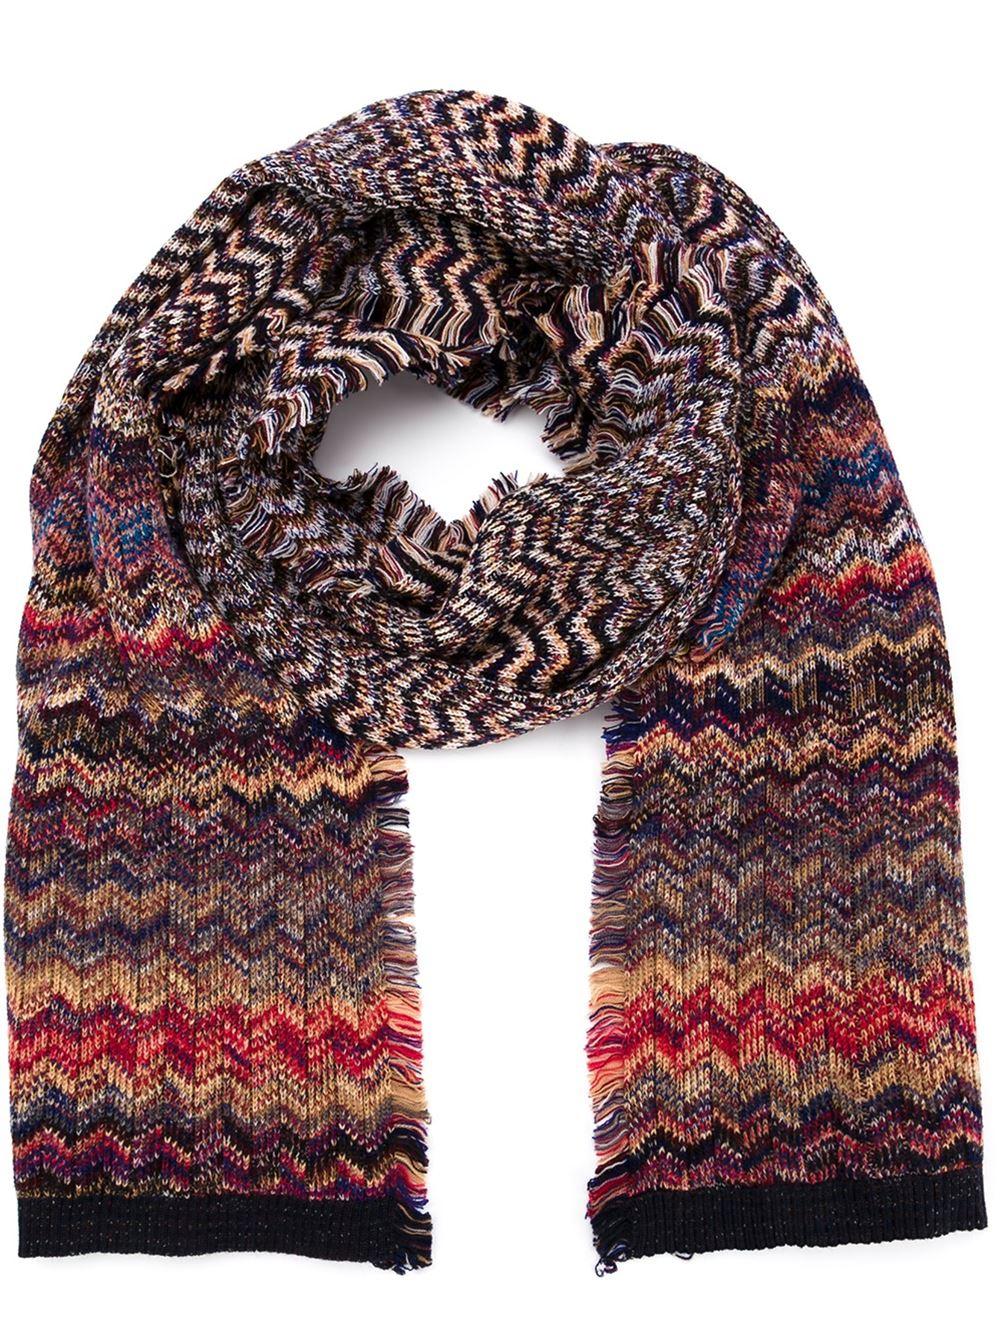 Crochet Zig Zag Scarf : Missoni Zig-zag Knit Scarf in Multicolor for Men Lyst